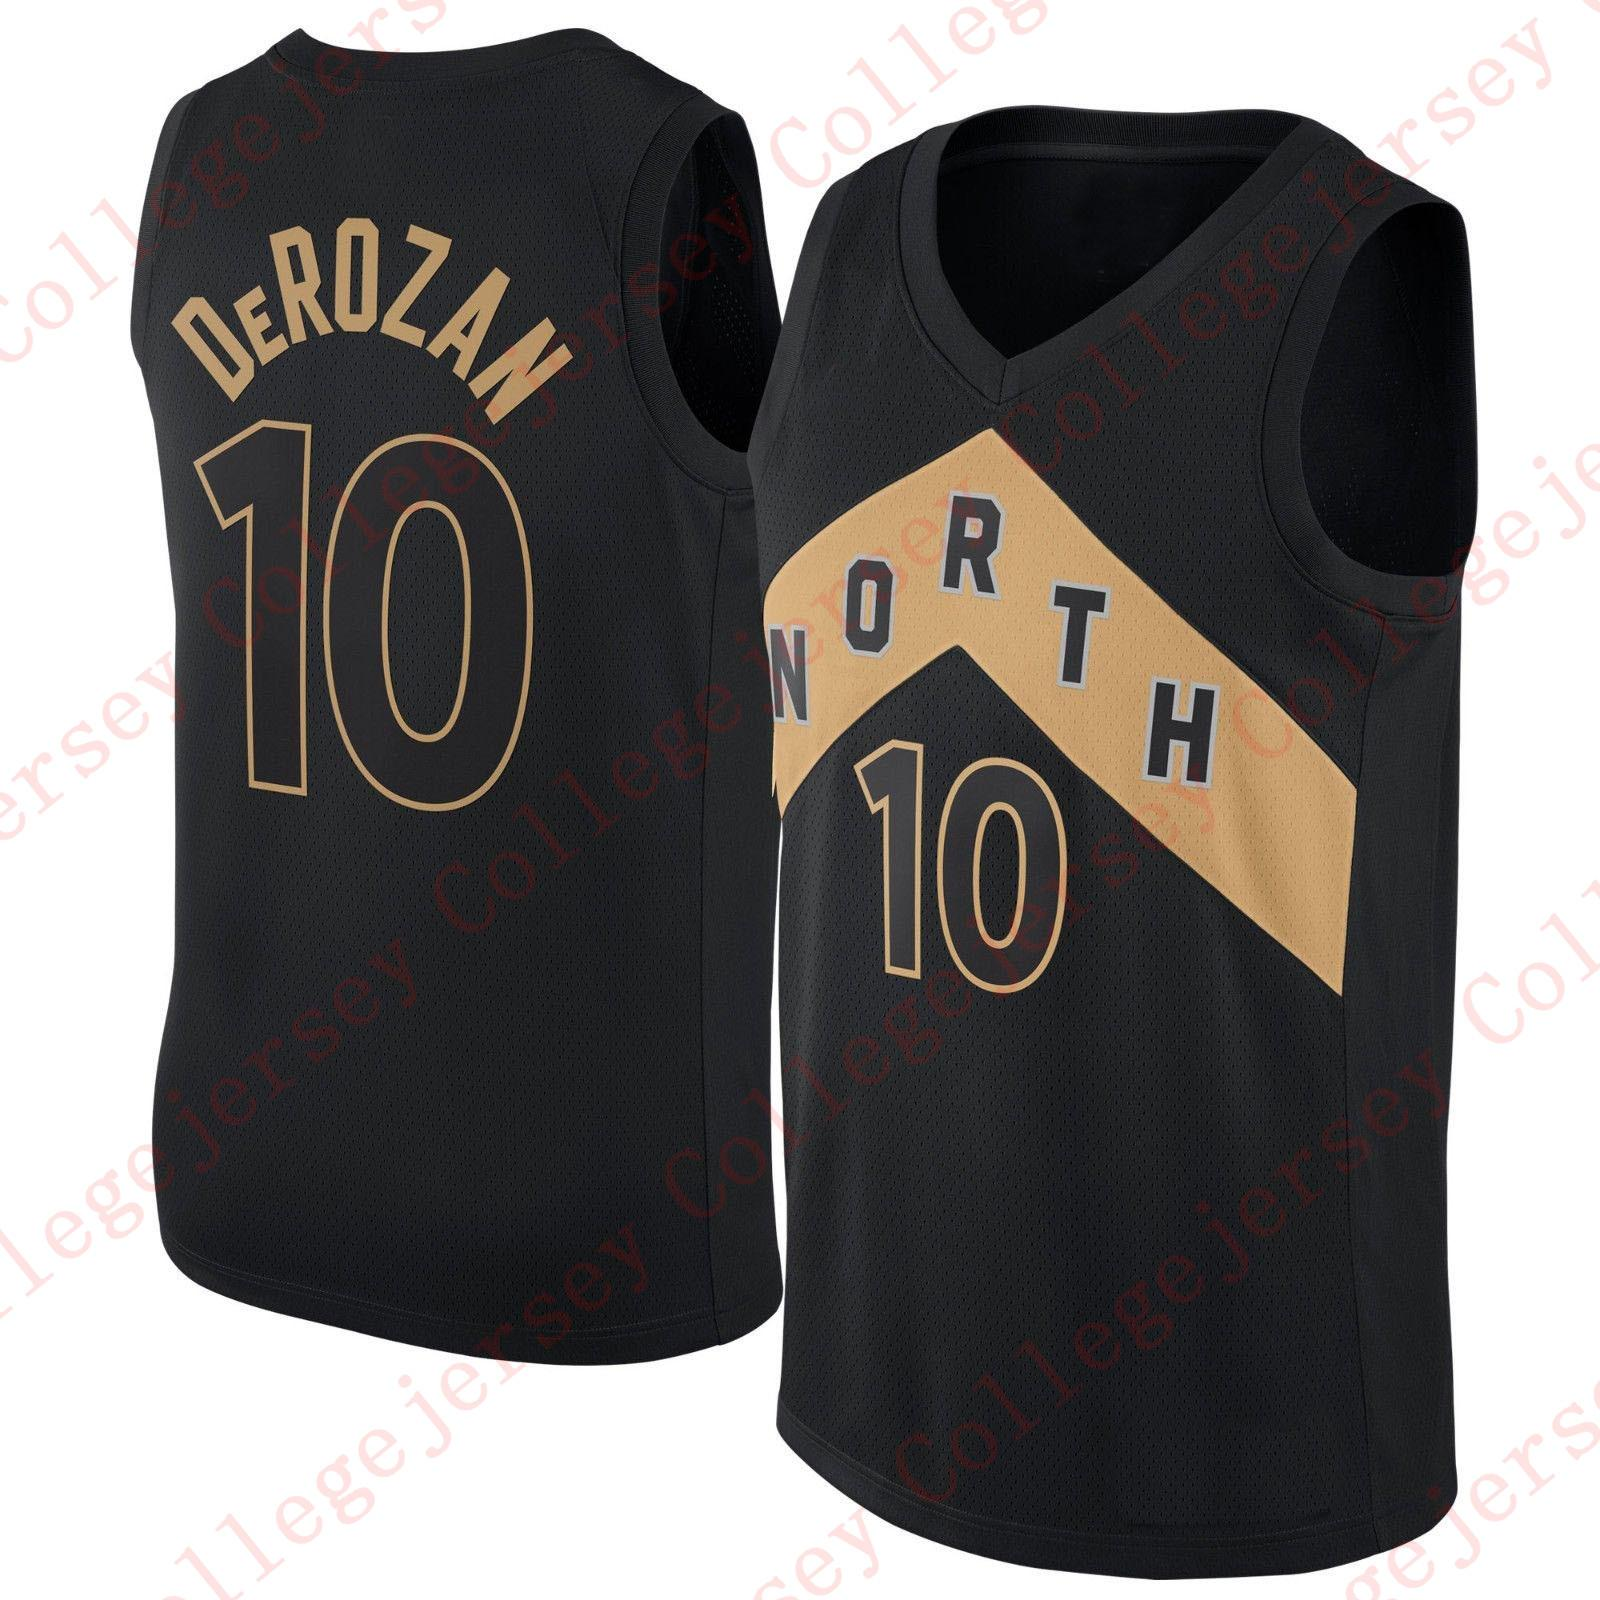 05c1faadba9 ... cheap toronto 10 demar derozan jersey city ovo drake edition mesn  stitched basketball jerseys demar